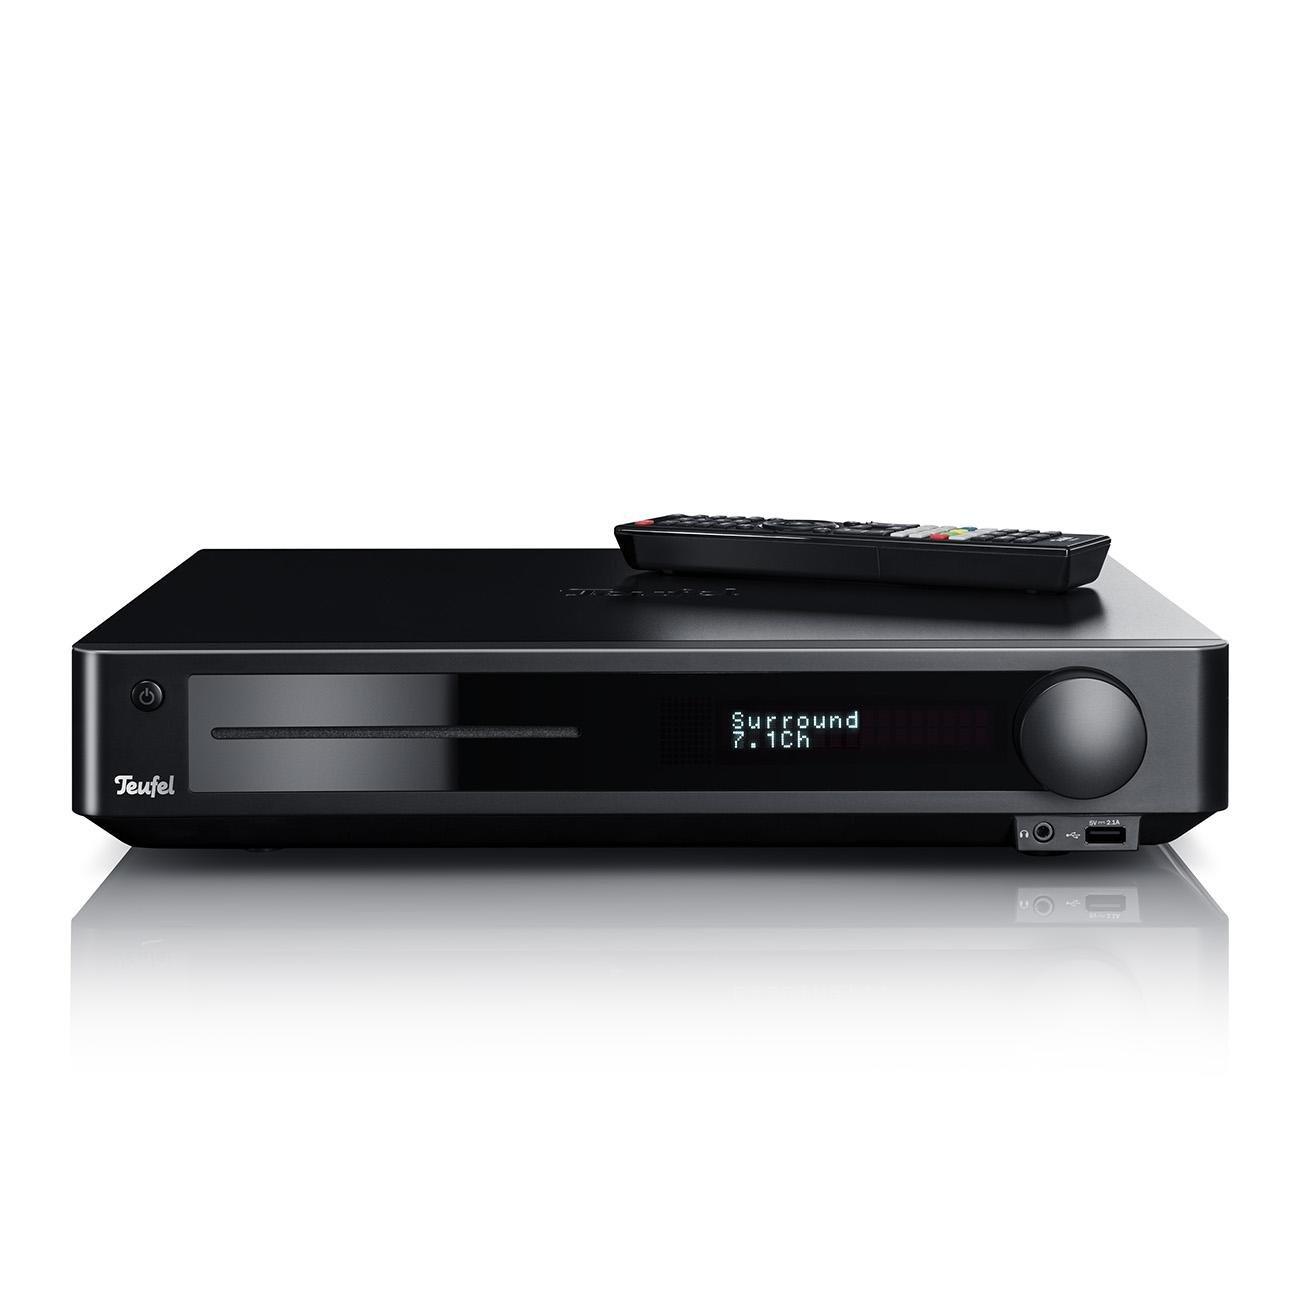 Teufel Impaq 8000,Teufel Impaq 8000 Test, Teufel Impaq 8000 kaufen, Blu-Ray AV-Receiver, Blu-Ray AV-Receiver Test, Blu-Ray AV-Receiver kaufen, Receiver mit Blu-Ray Funktion, AV Receiver mit Blu-Ray Funktion